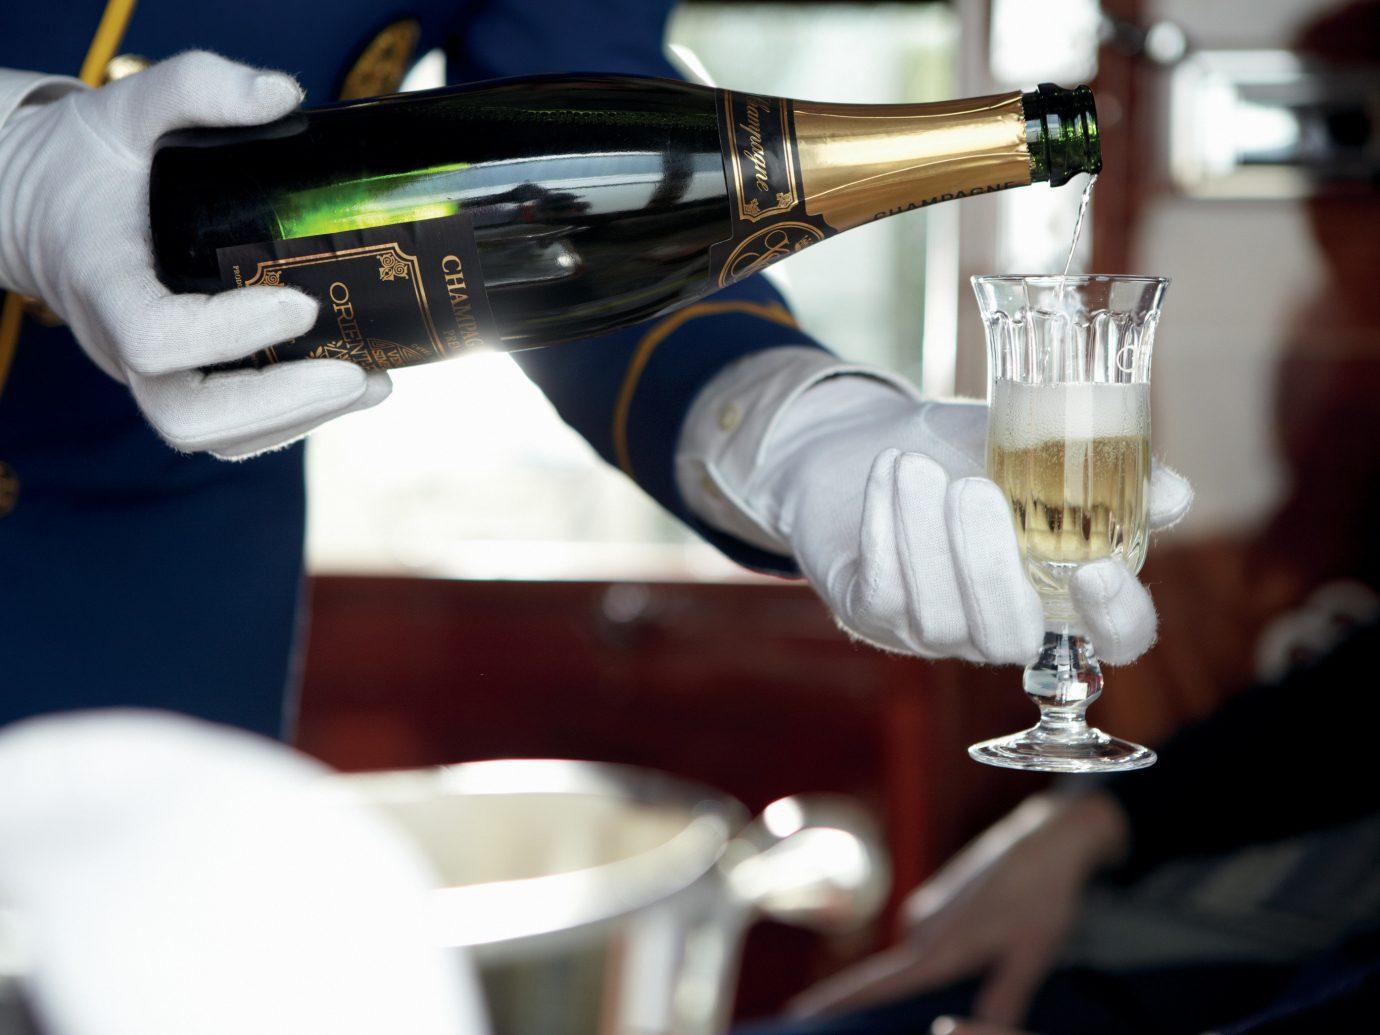 Luxury Travel Trip Ideas indoor alcohol Drink vehicle drum wine glass appliance